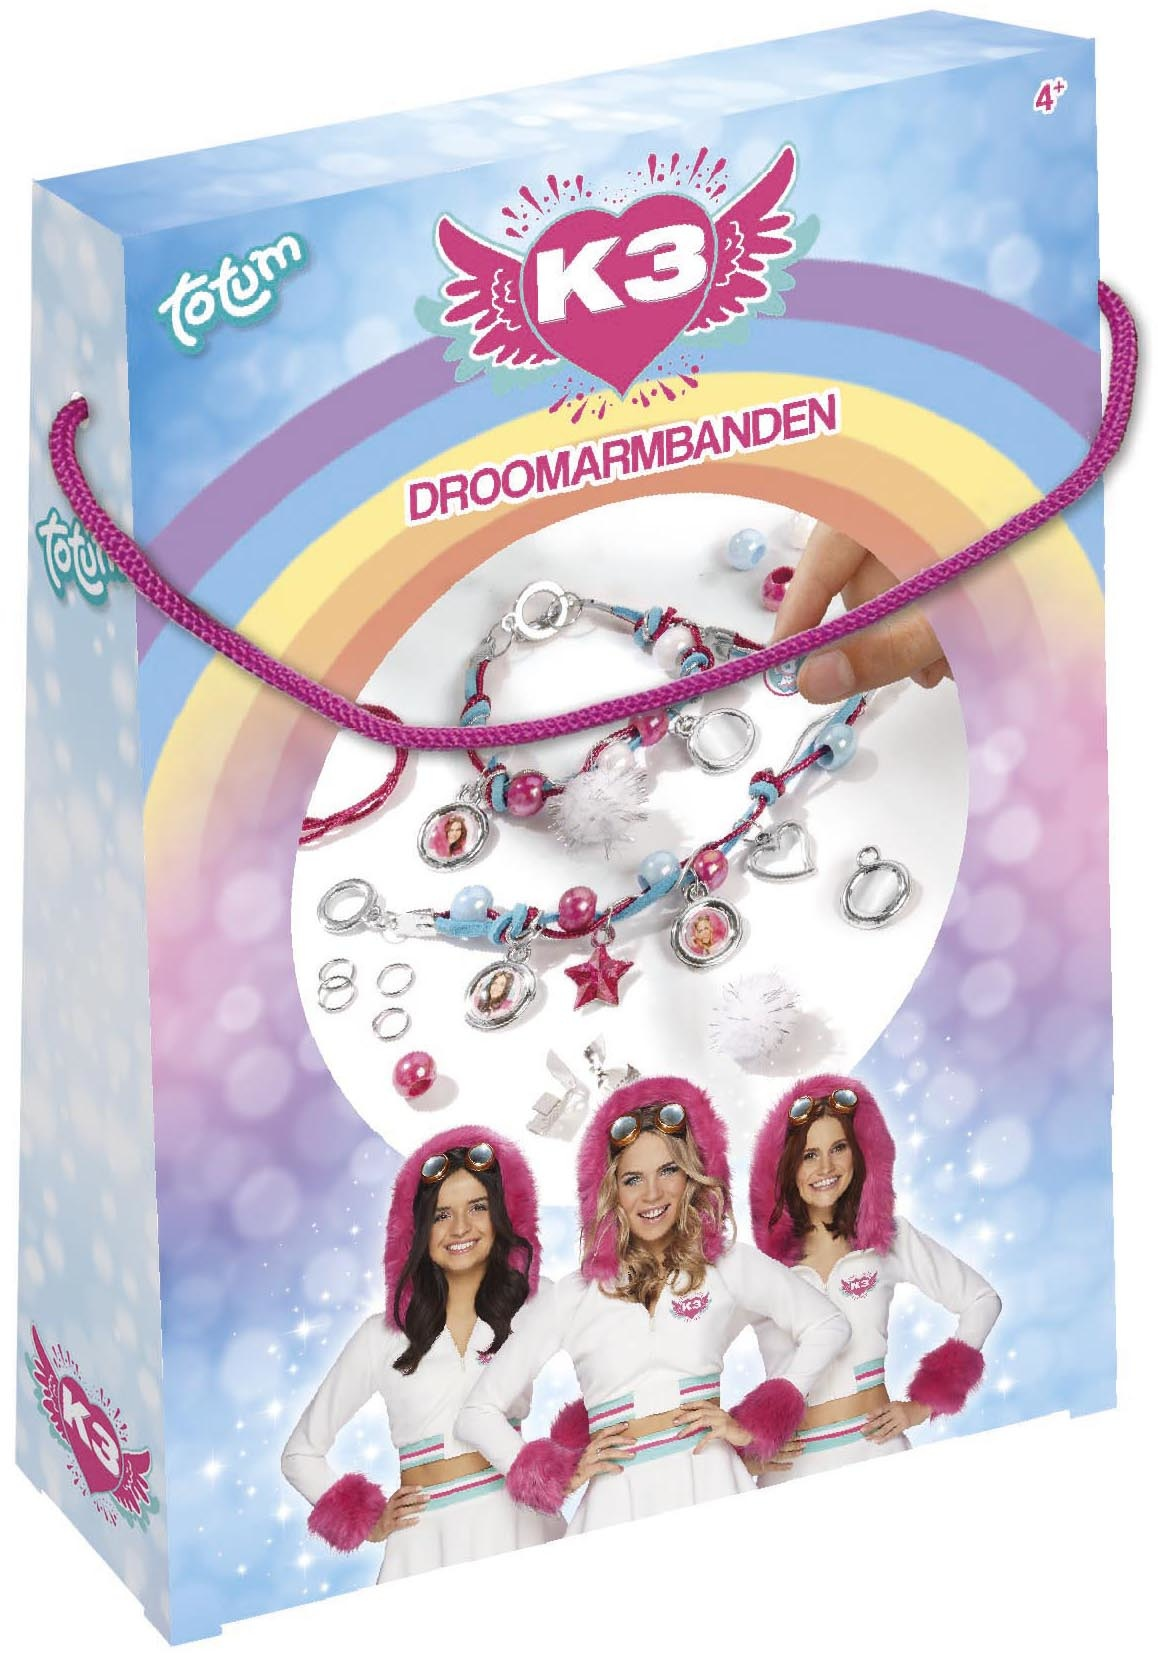 Droomarmbanden K3